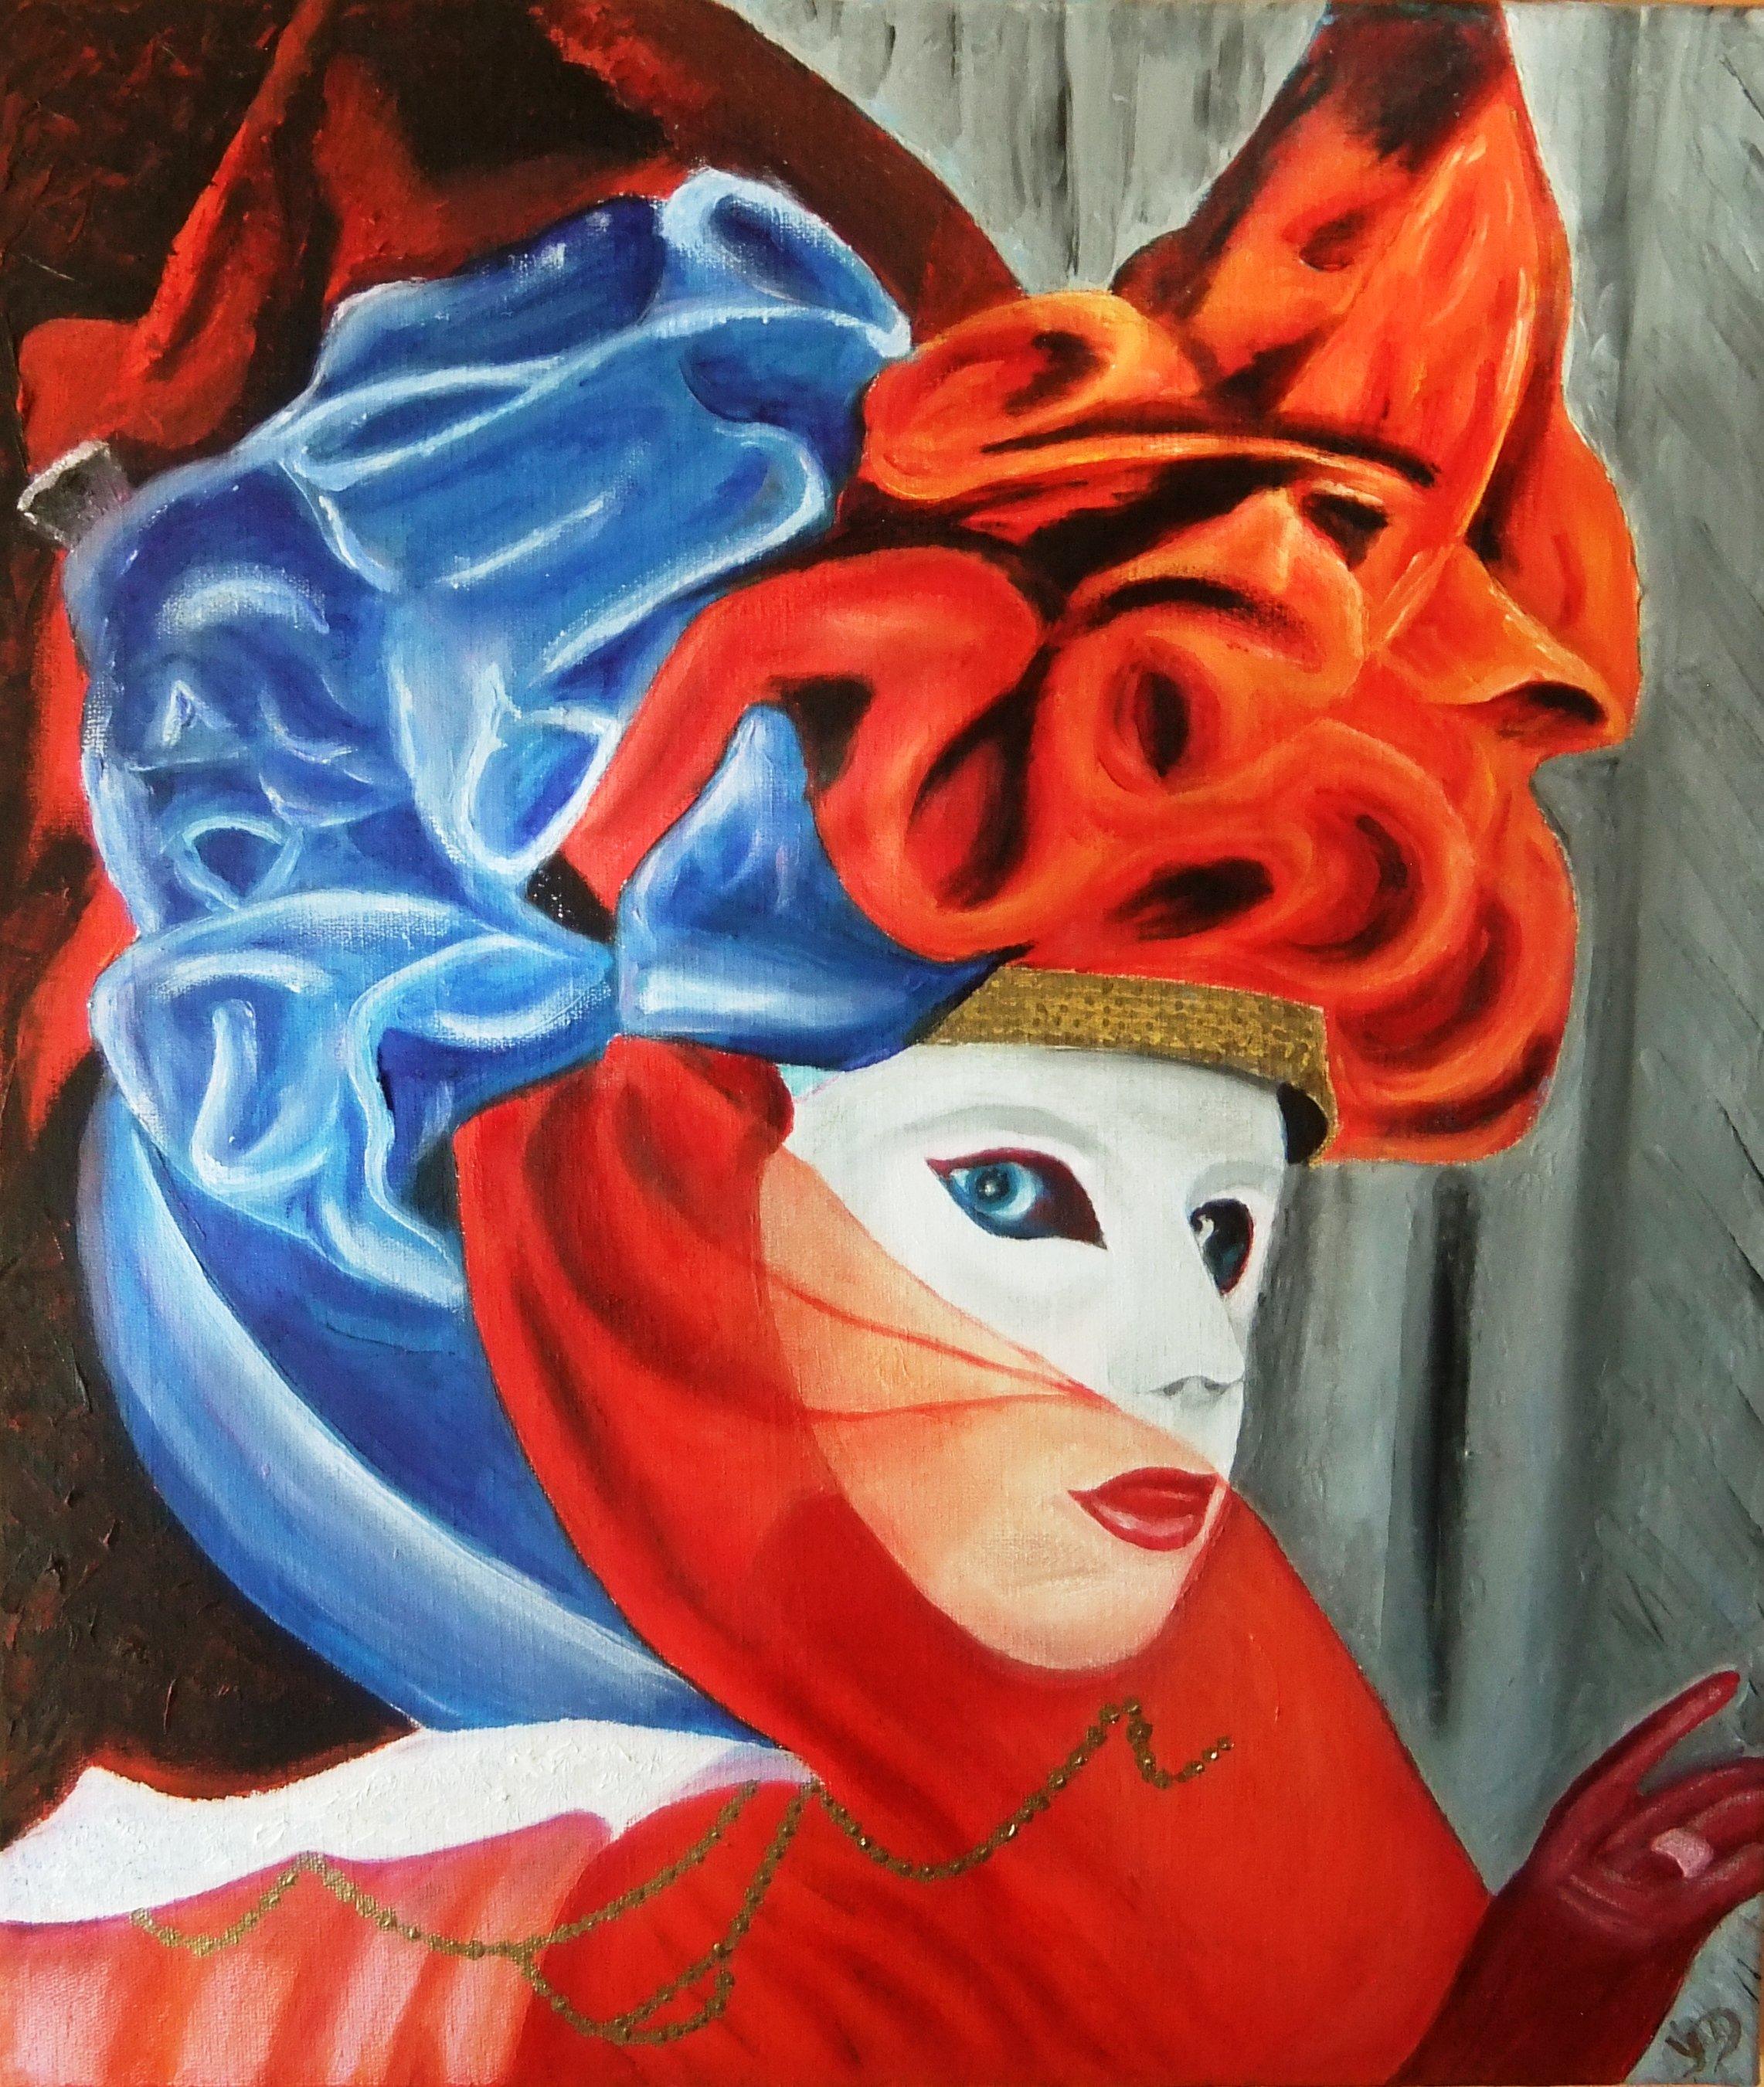 Yvon delvoye galerie de peintures - Masque a peinture ...